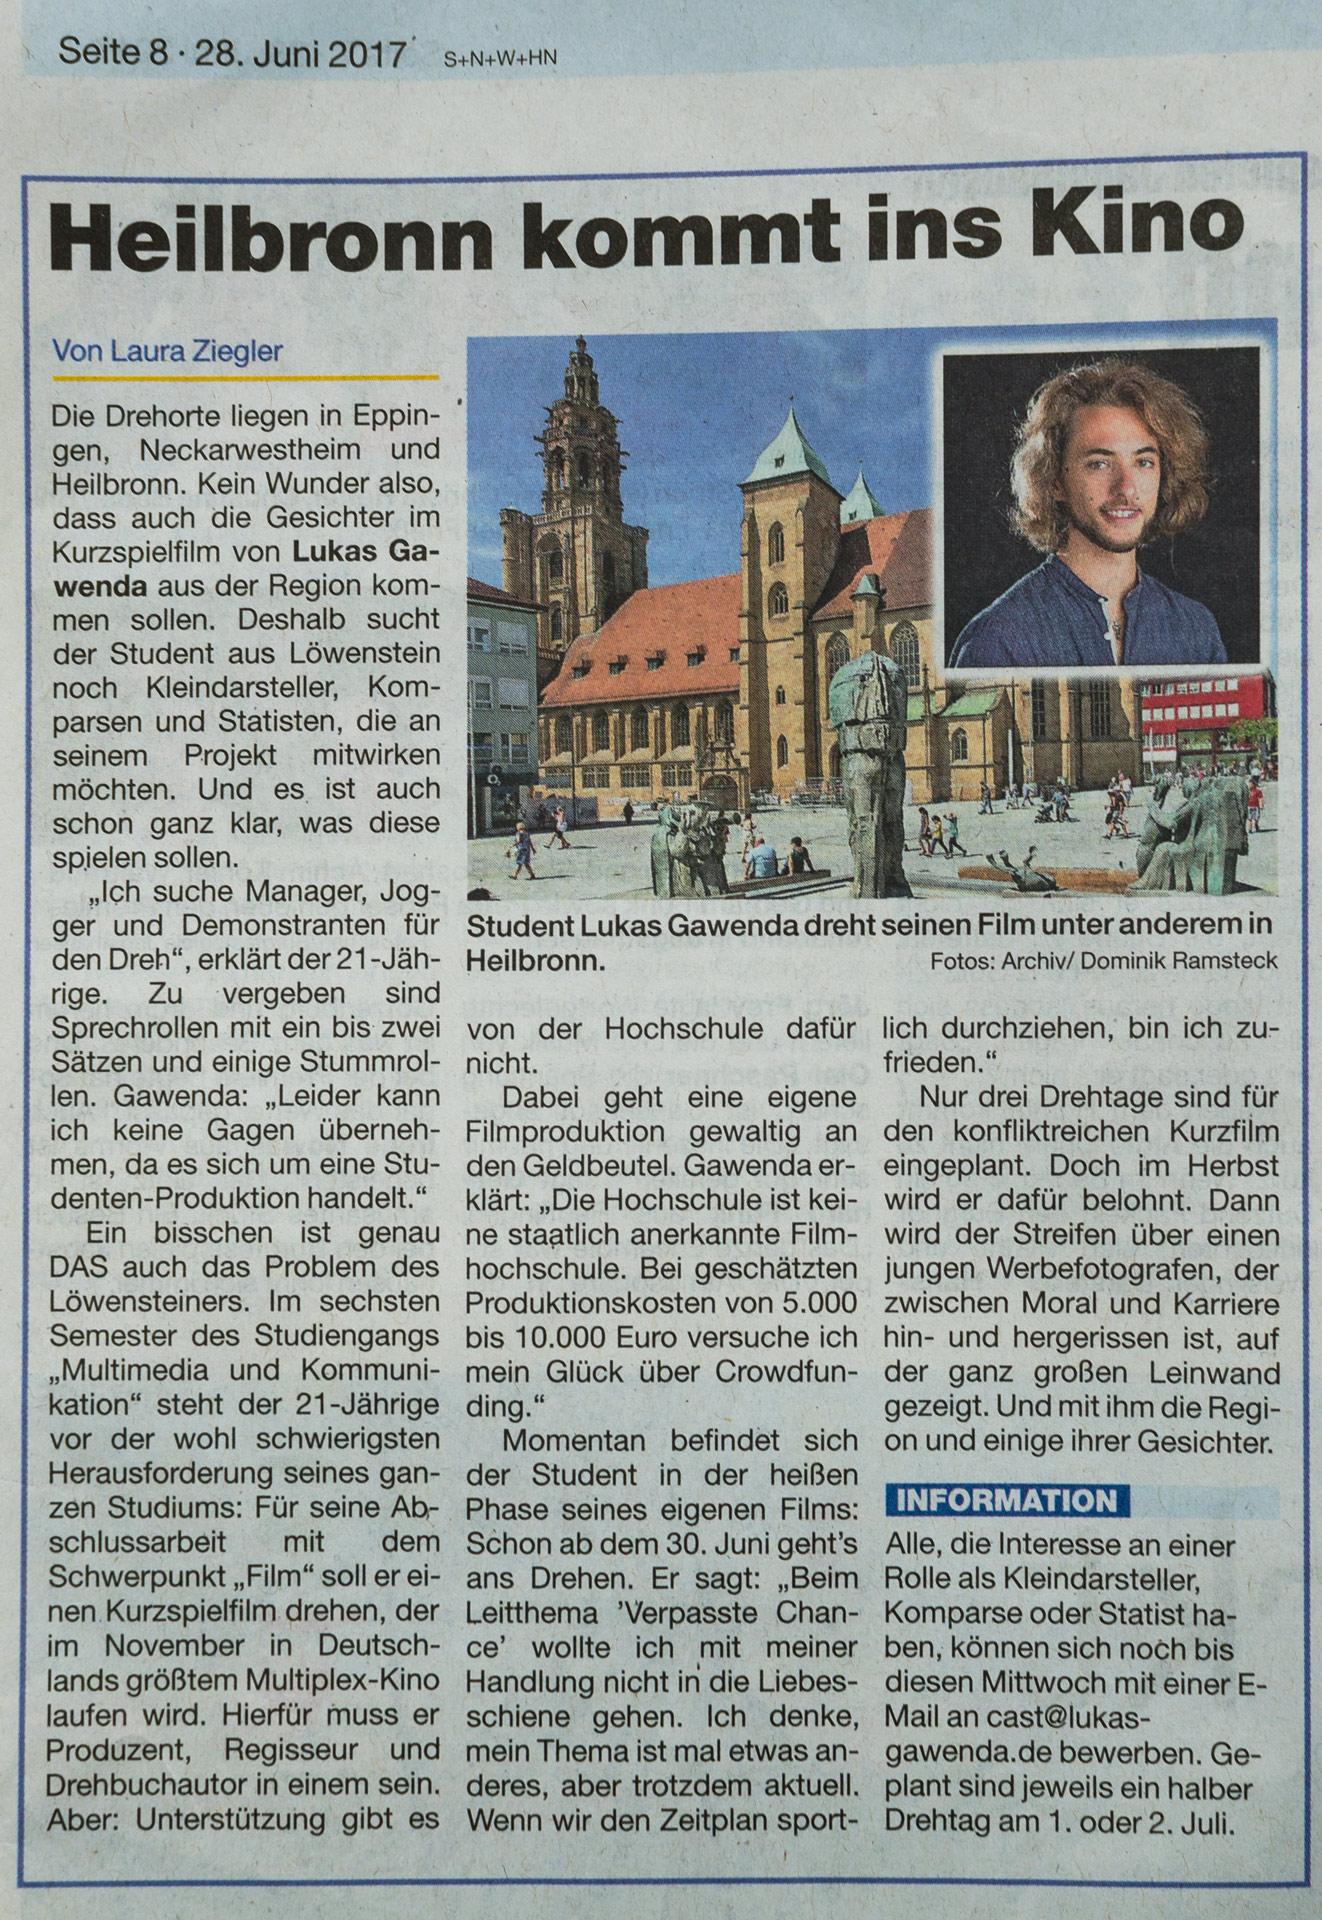 """Heilbronn kommt ins Kino"" (Echo am Mittwoch, 28.06.2017, S. 8)"